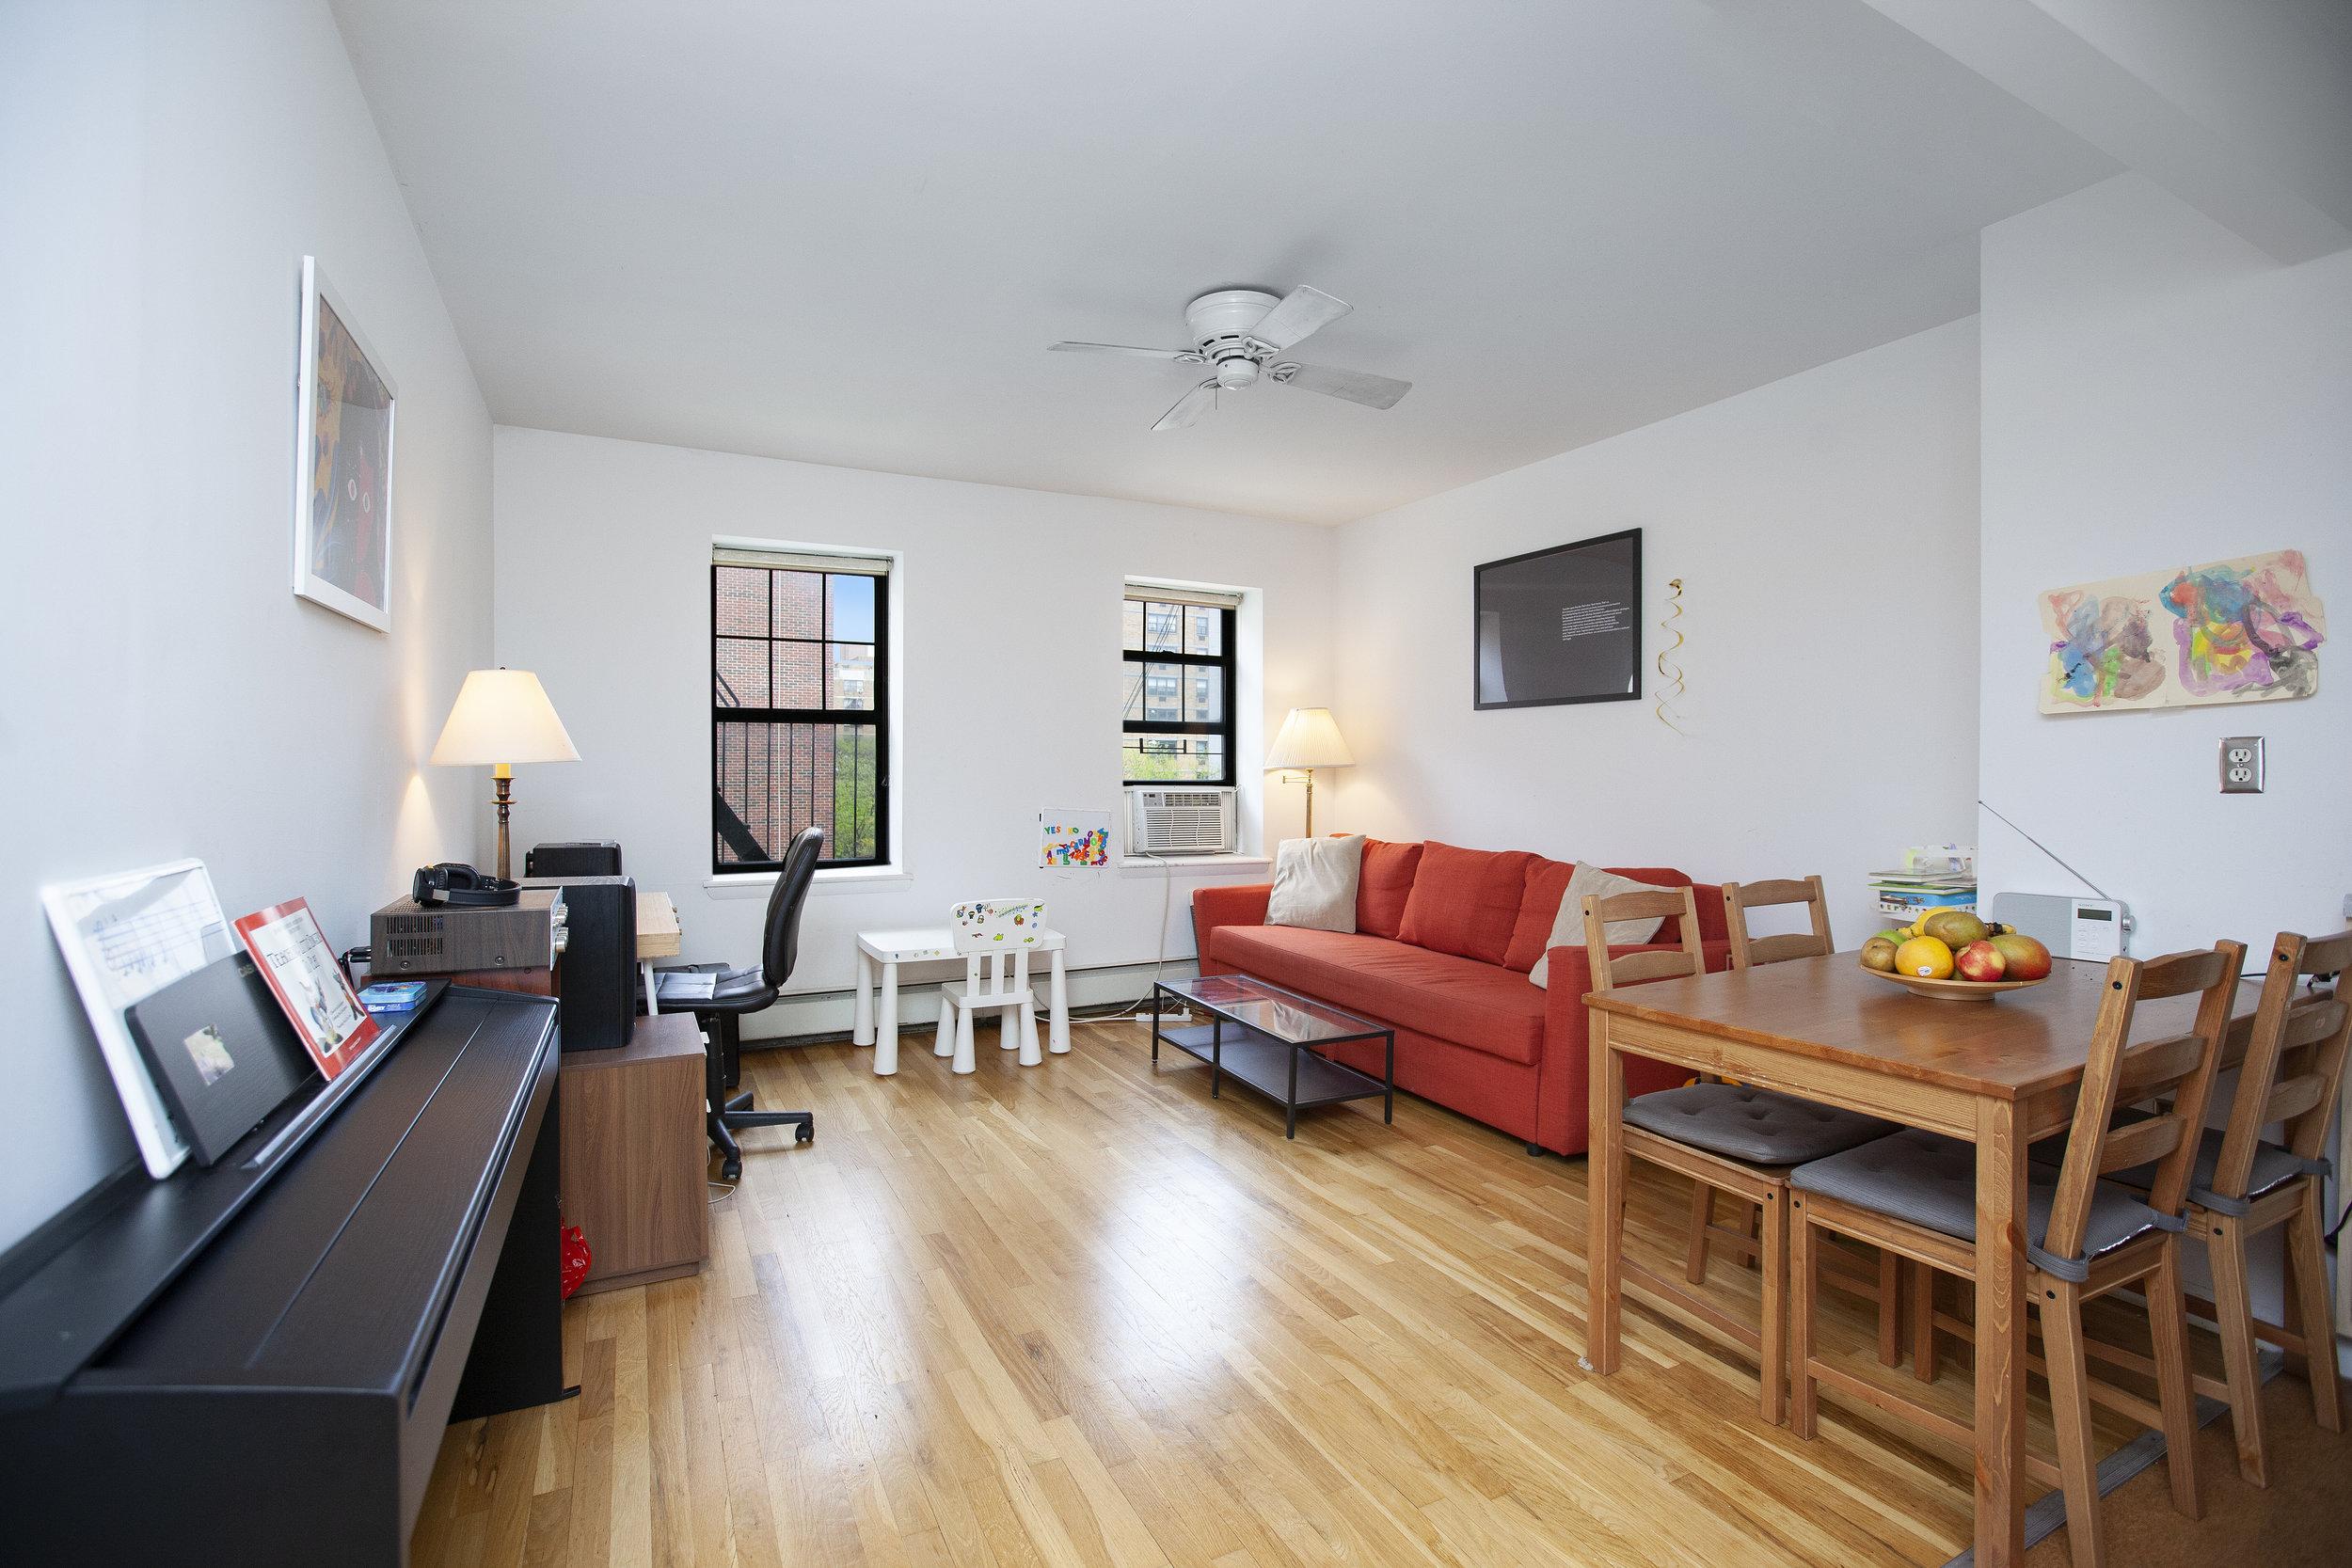 East_11th_Street_619_4B_Living_Room_.jpg